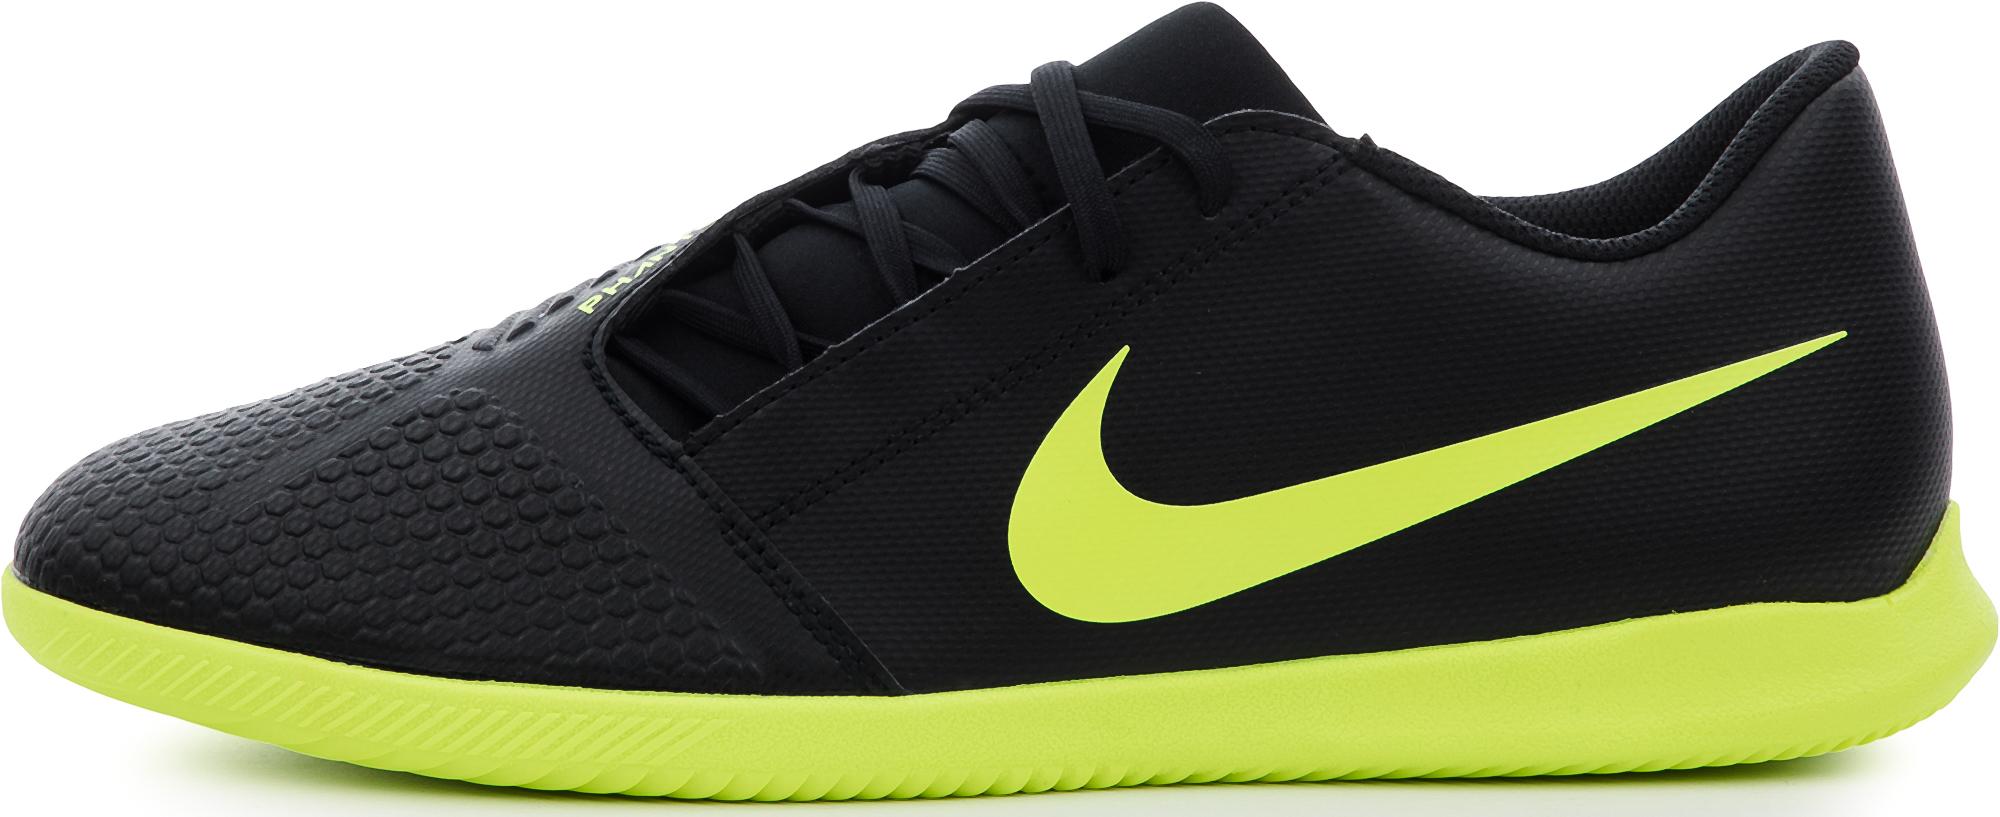 Nike Бутсы мужские Nike Phantom Venom Club Ic, размер 45